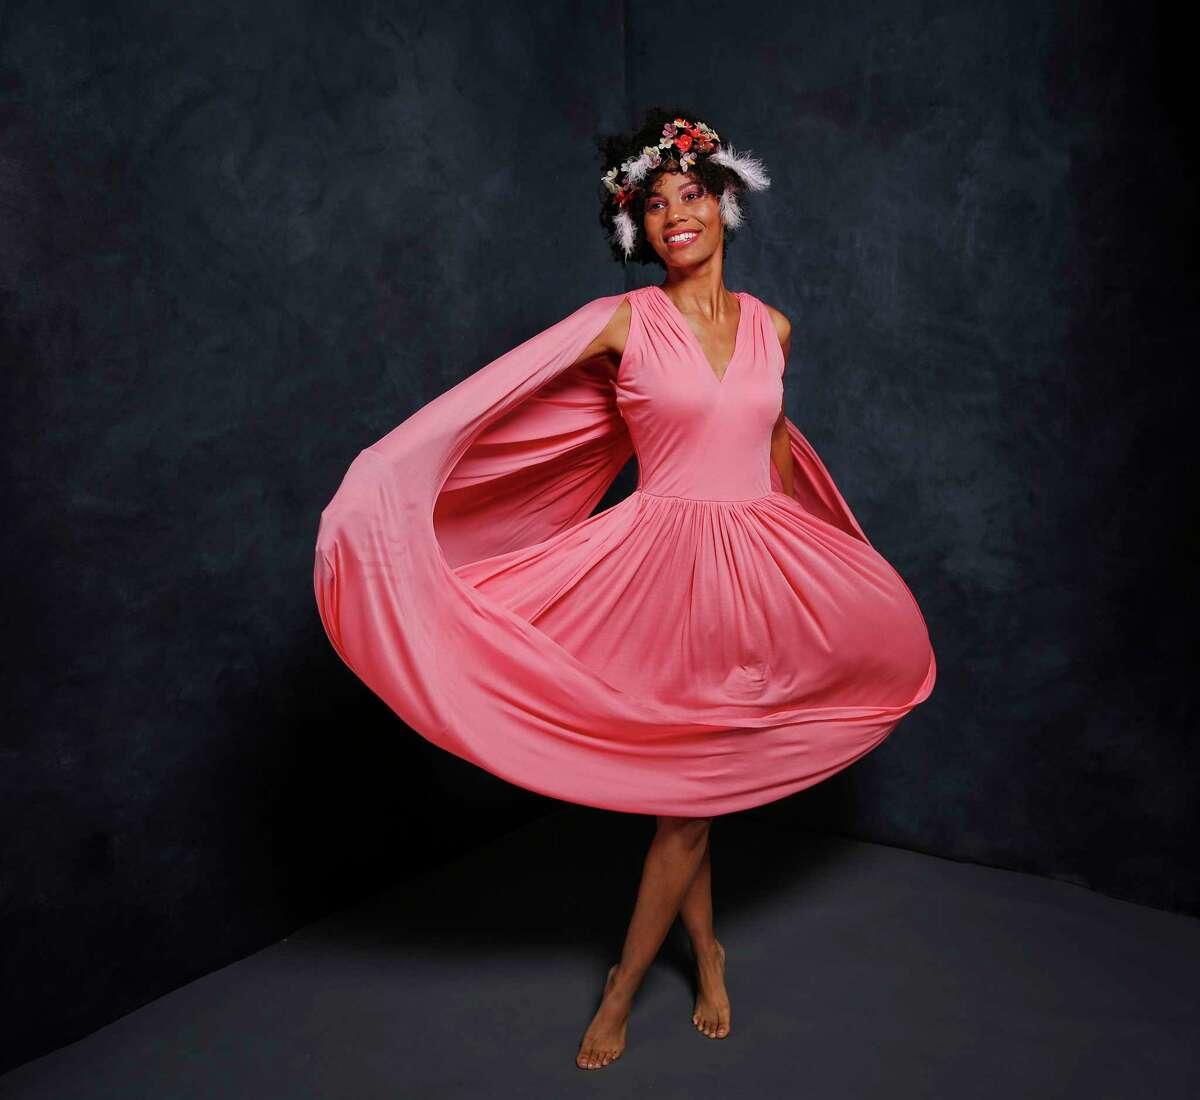 Orchid: Celine infinite dress, $2,800, Saks Fifth Avenue; Alexis Berger glass flower crown, $2,500, alexisberger.com.